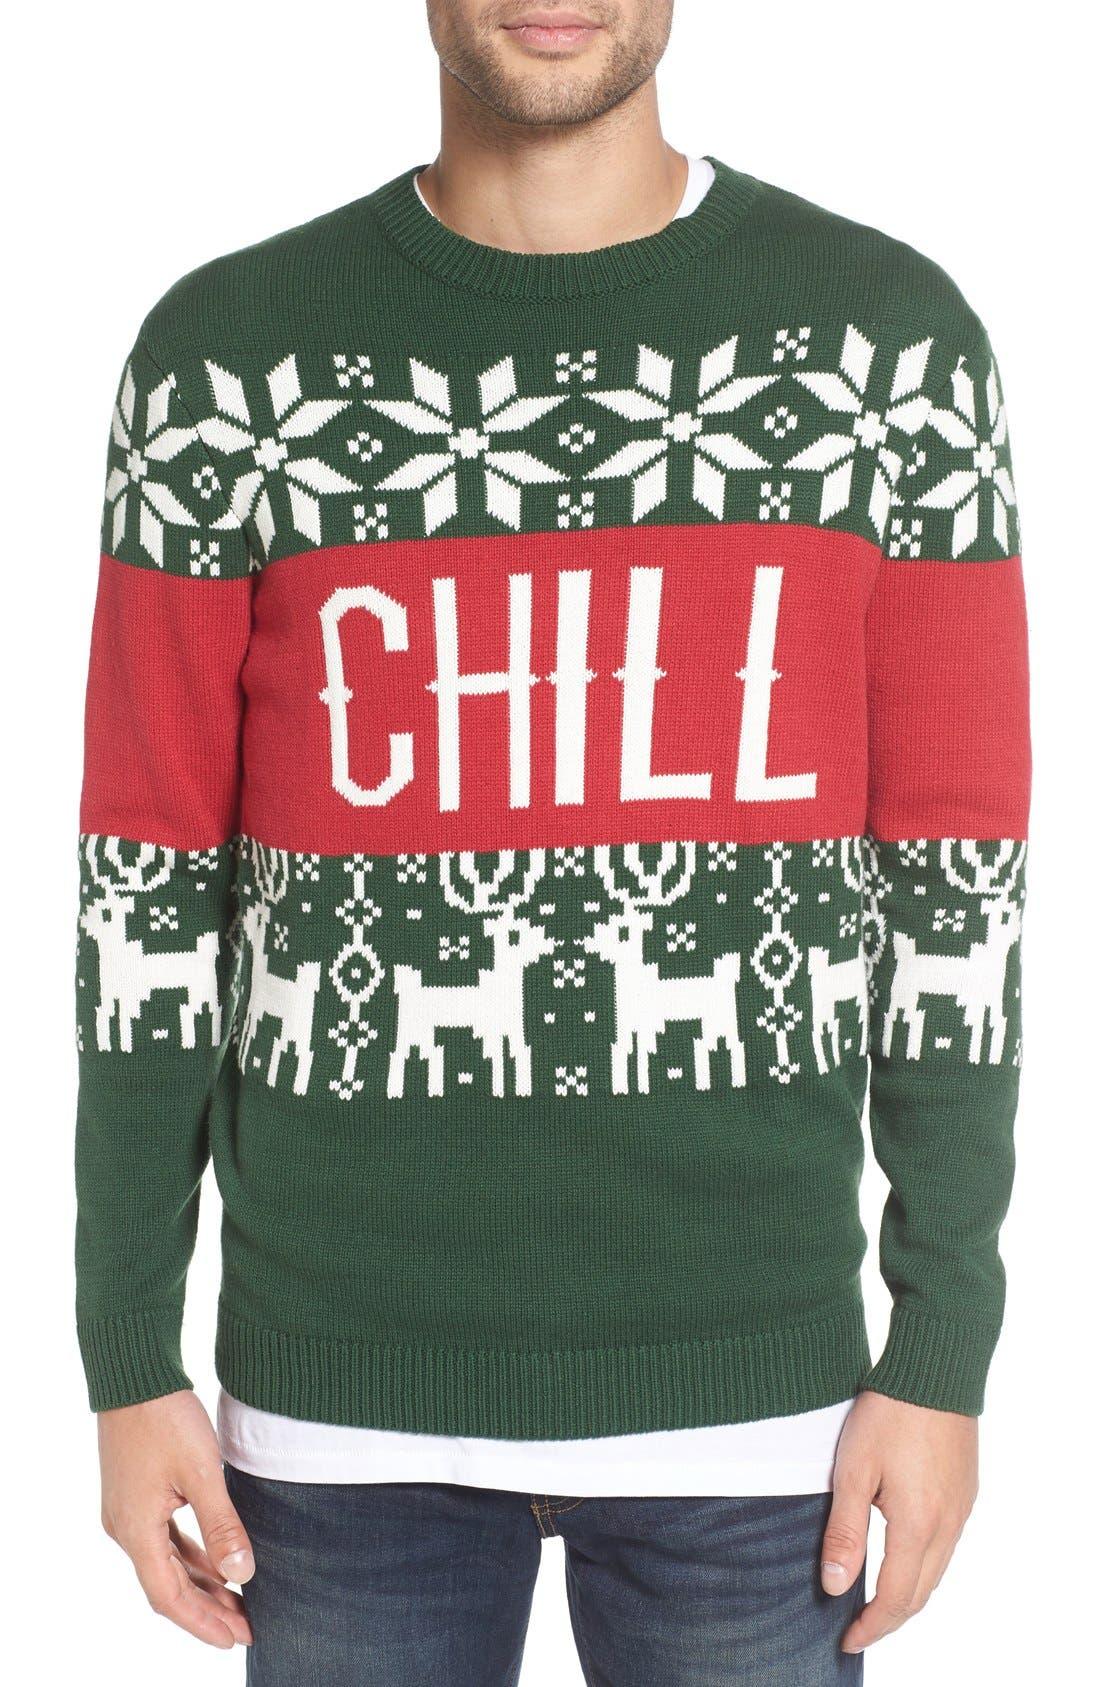 Main Image - Altru 'Chill Vibes' Intarsia Crewneck Sweater